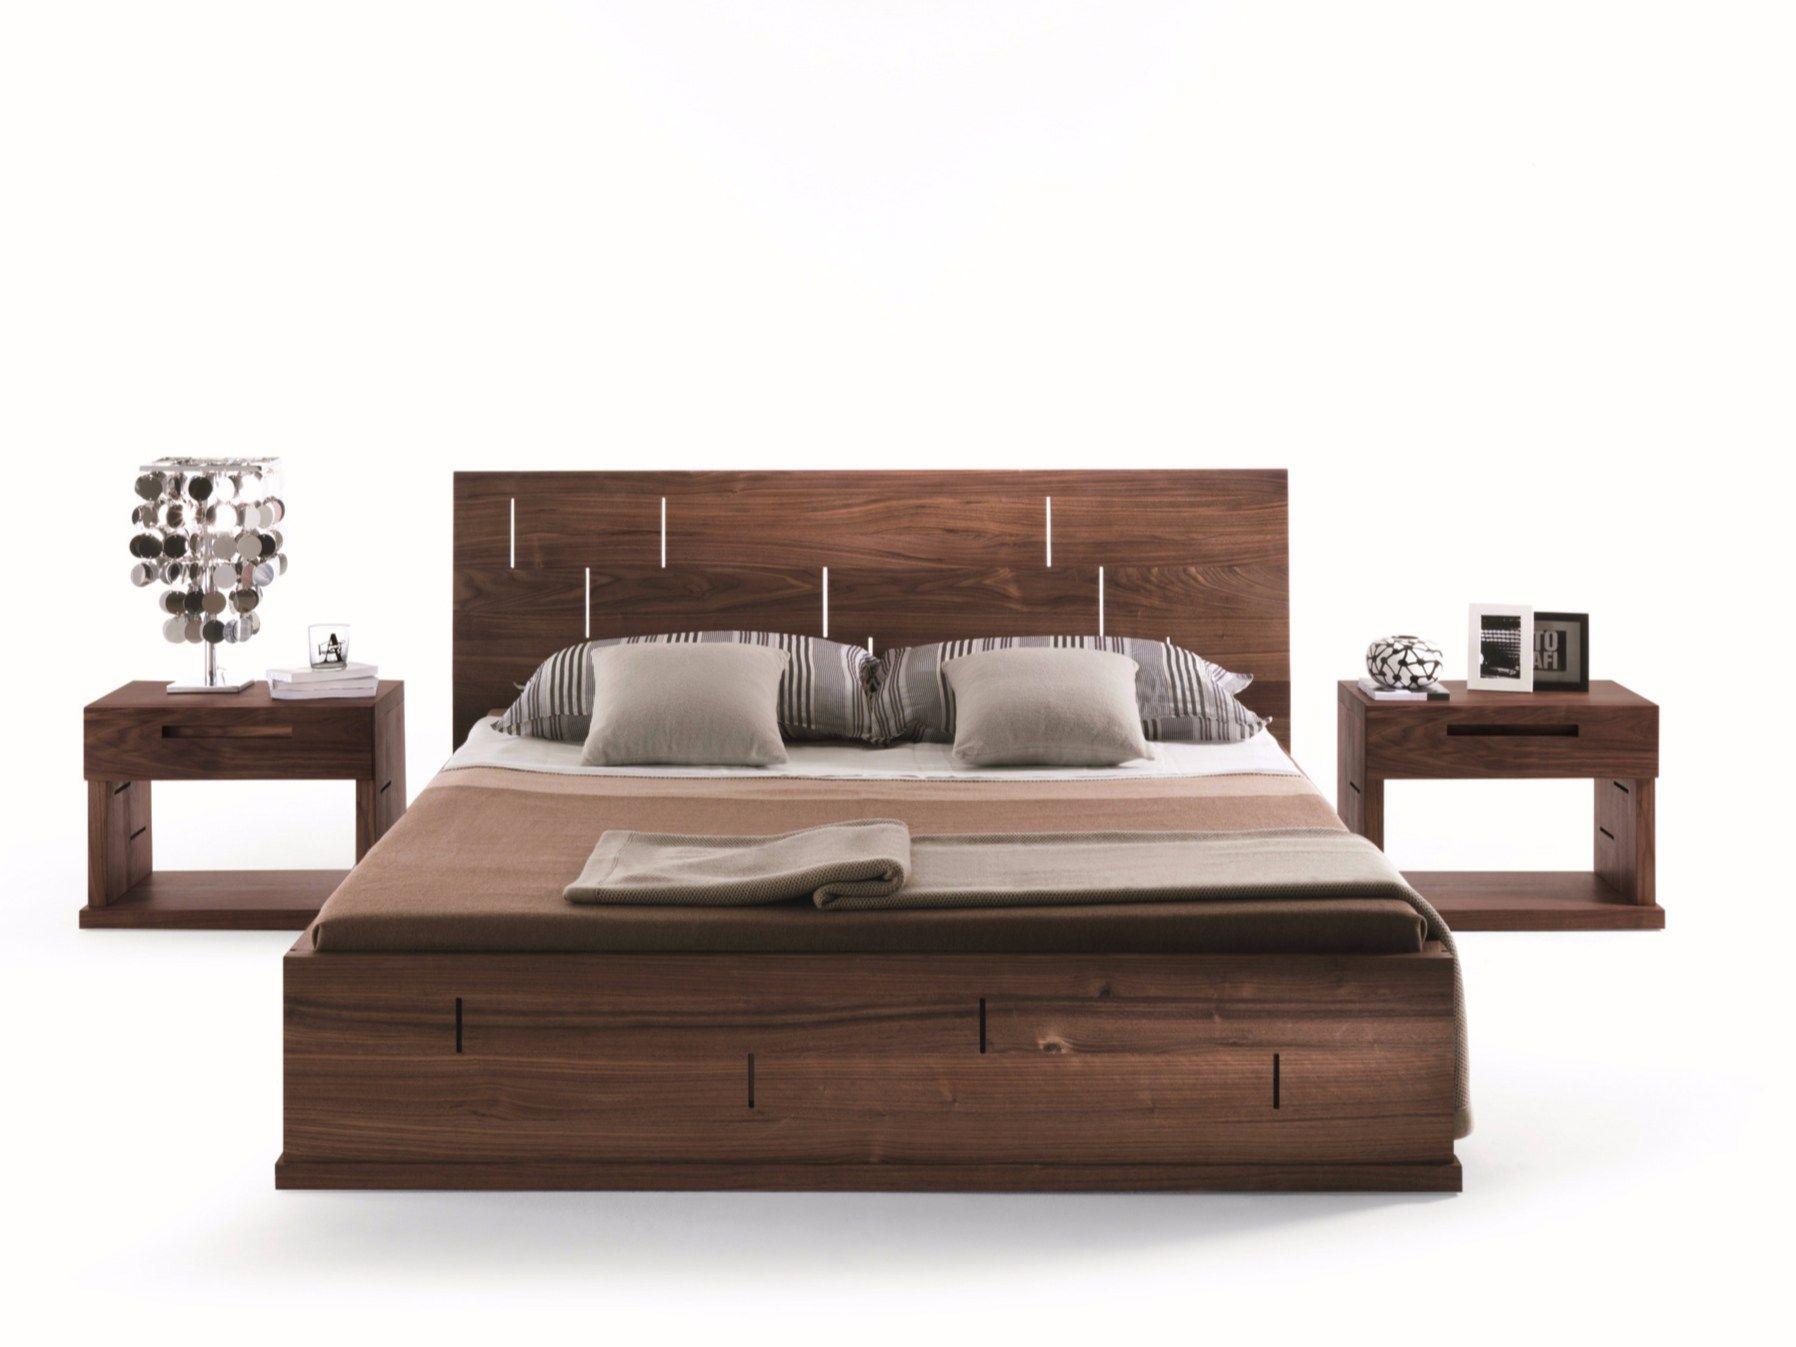 lit double en bois massif vera lit riva 1920 lit chambre pinterest double beds solid. Black Bedroom Furniture Sets. Home Design Ideas